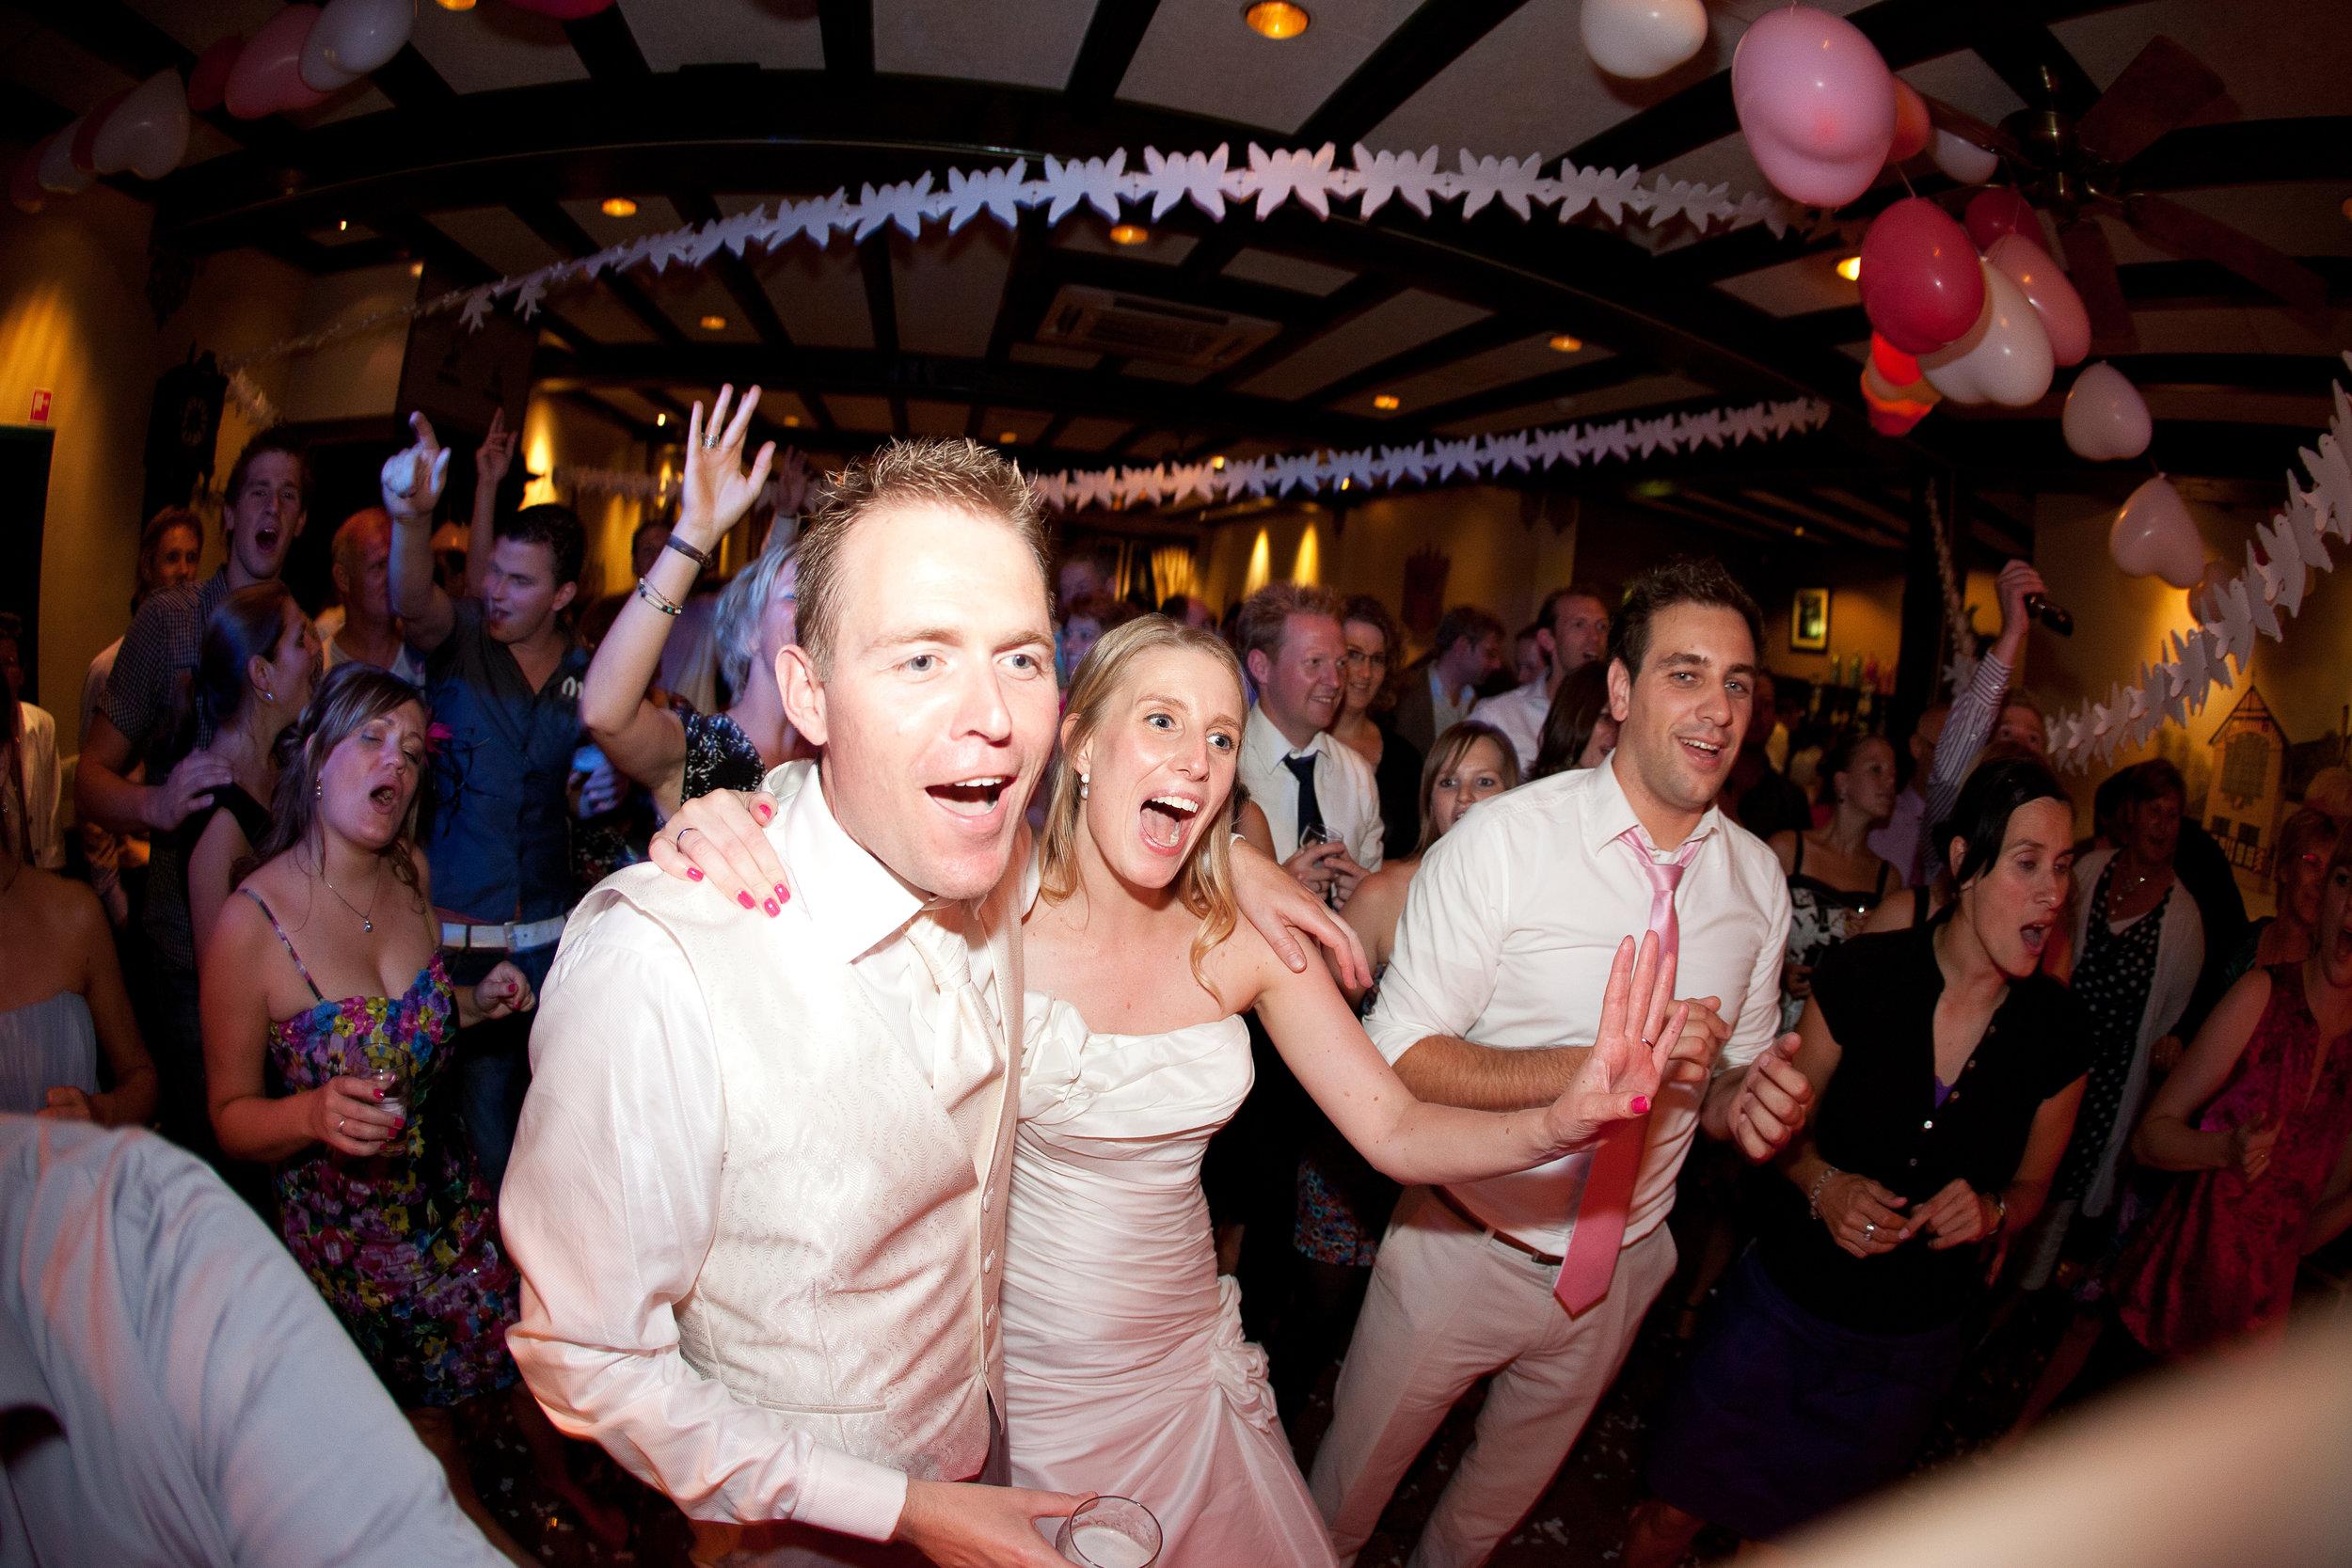 trouwshoot-bruidsfotografie-trouwfoto-feestfotografie-trouwreportage-Jan en Loes594.jpg